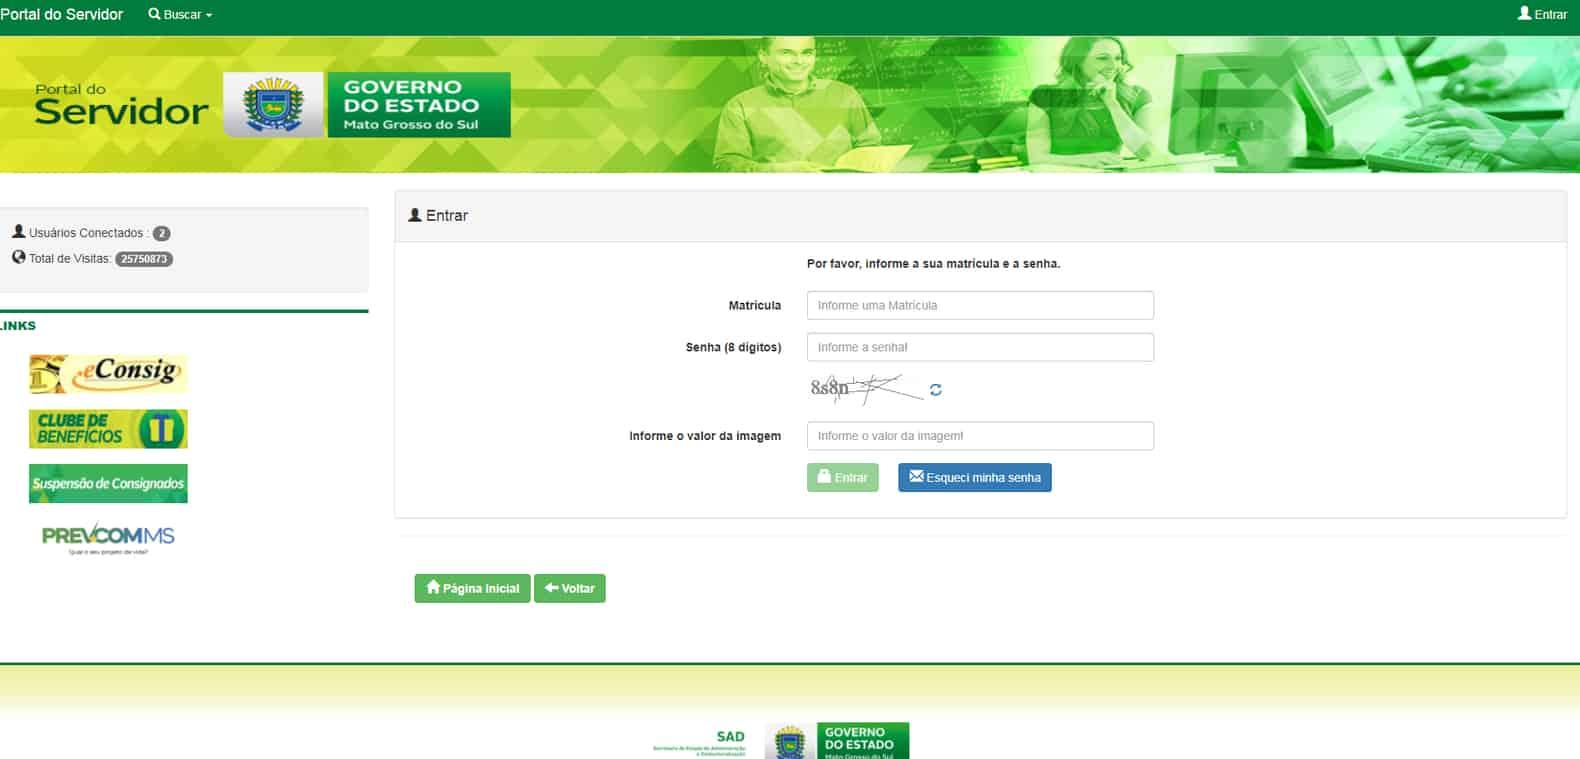 Portal do Servidor MS